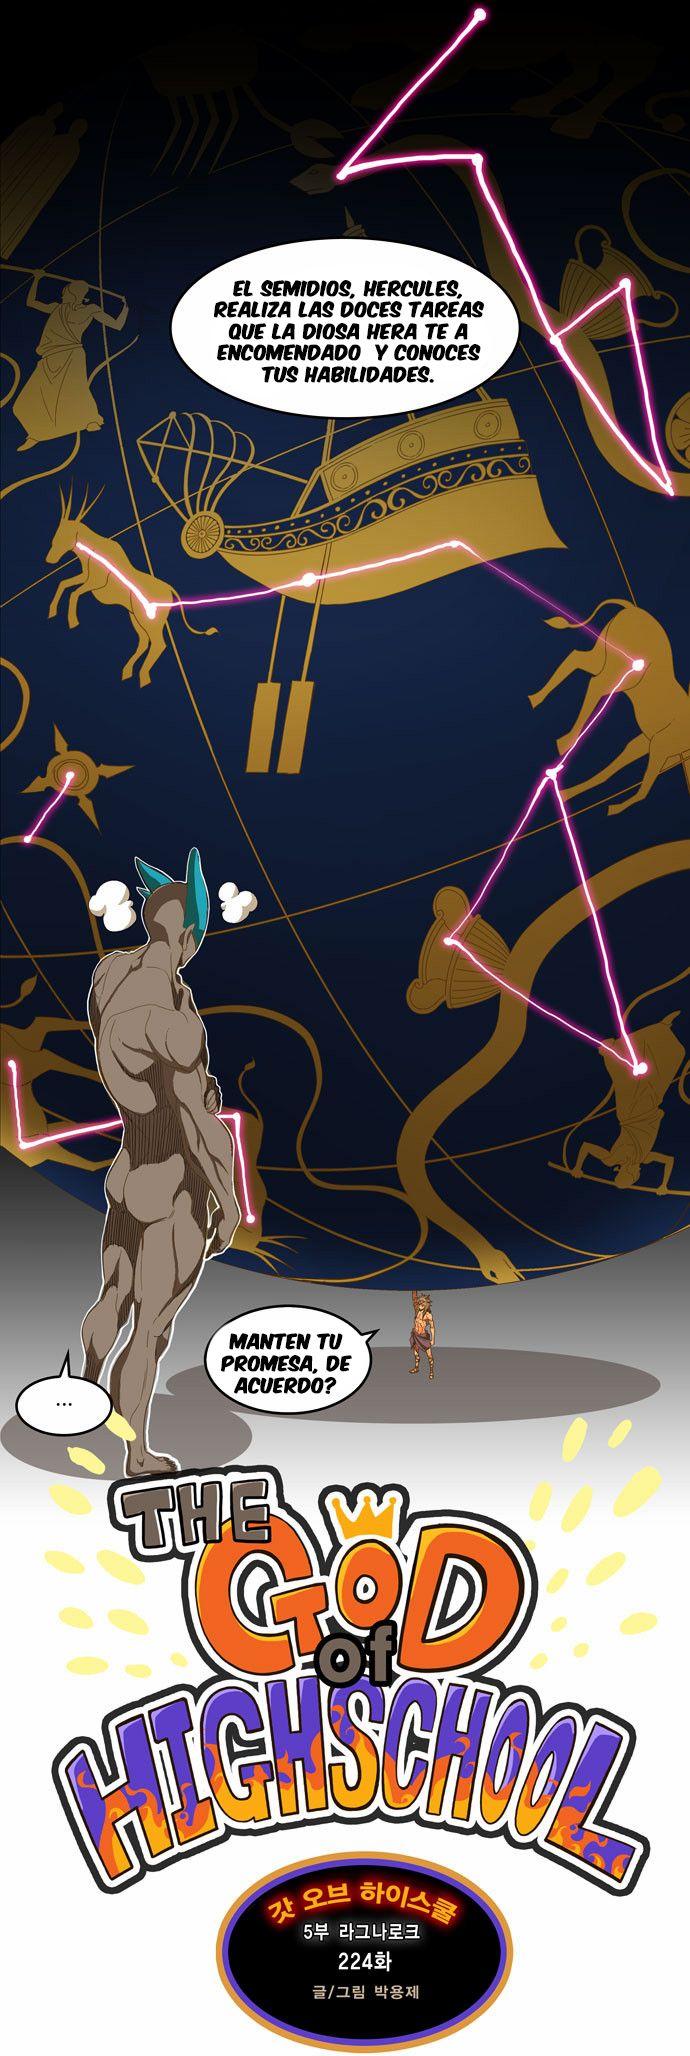 http://c5.ninemanga.com/es_manga/37/485/456291/2df41f38afef75d8c599483001daf2e1.jpg Page 5